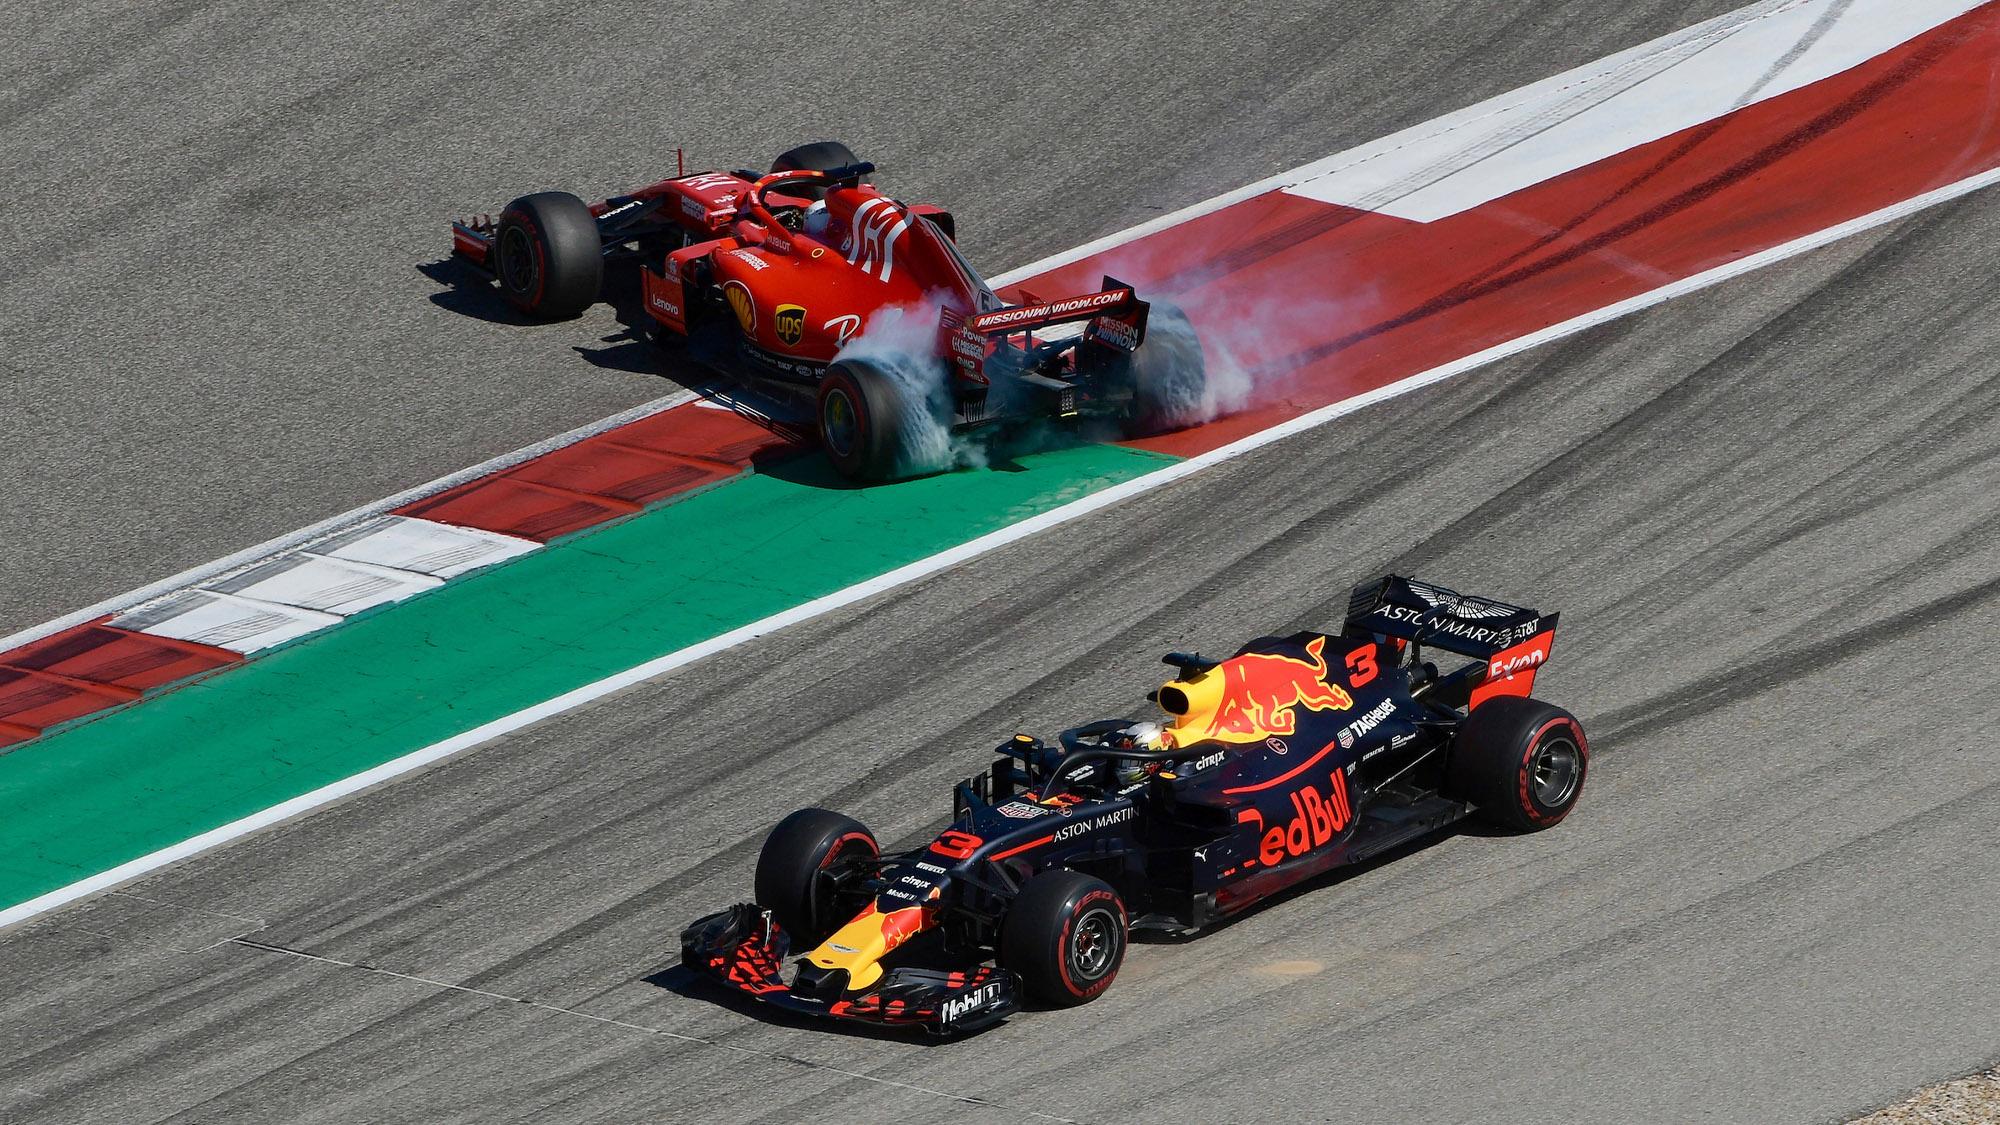 Sebastian Vettel spins after hitting Daniel Ricciardo at the 2018 United States Grand Prix